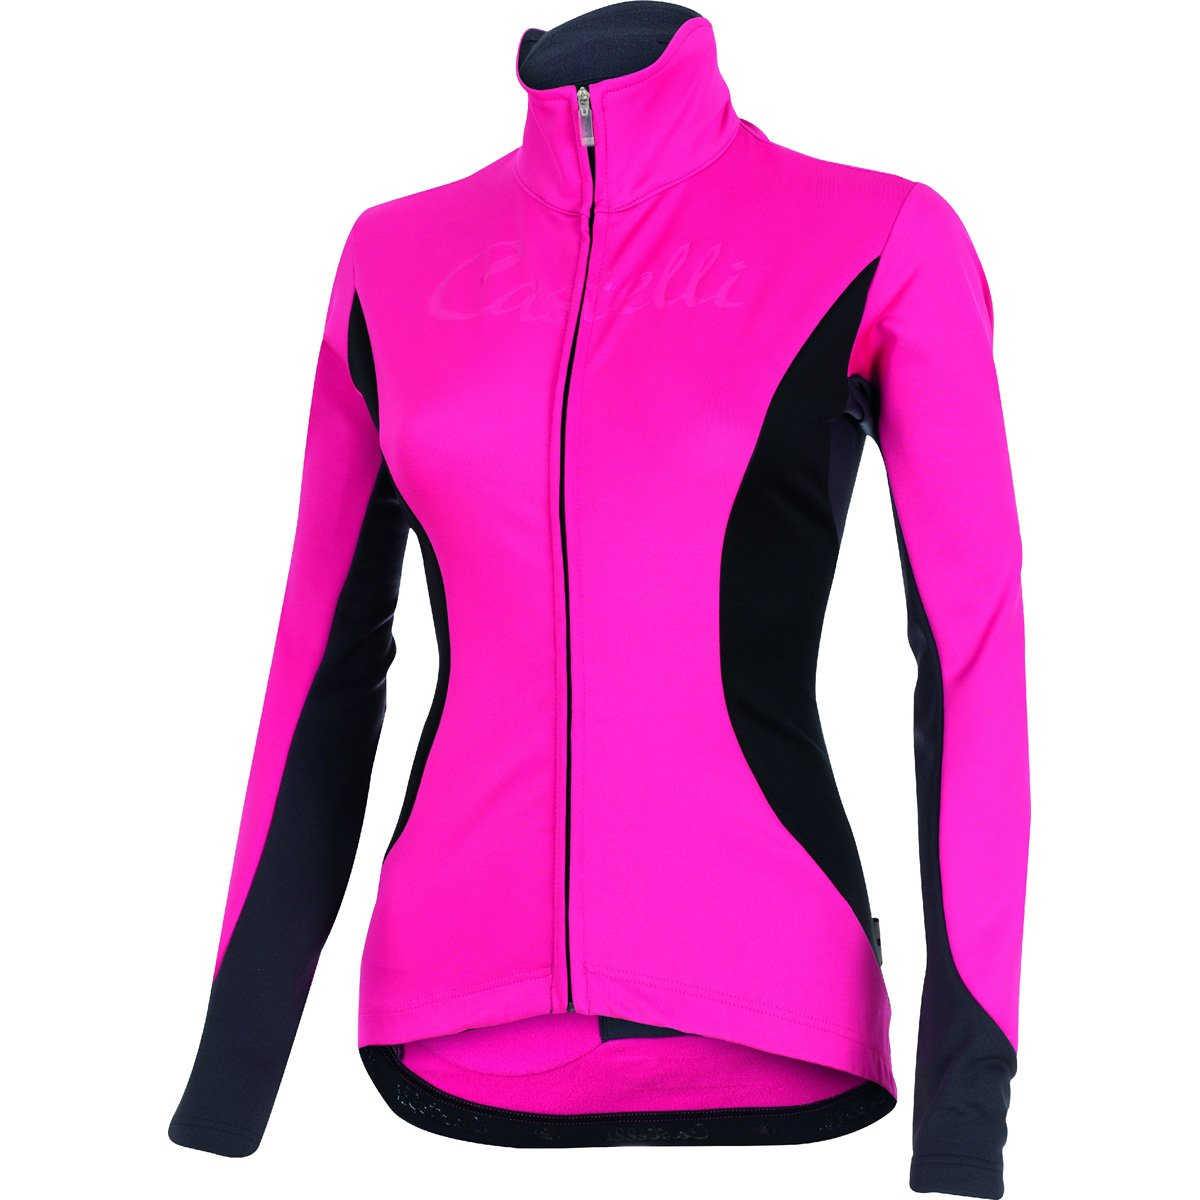 Castelli Trasparente 2フルジップJersey – Long Sleeve – Women 's X-Small ラズベリー B014I6WH20